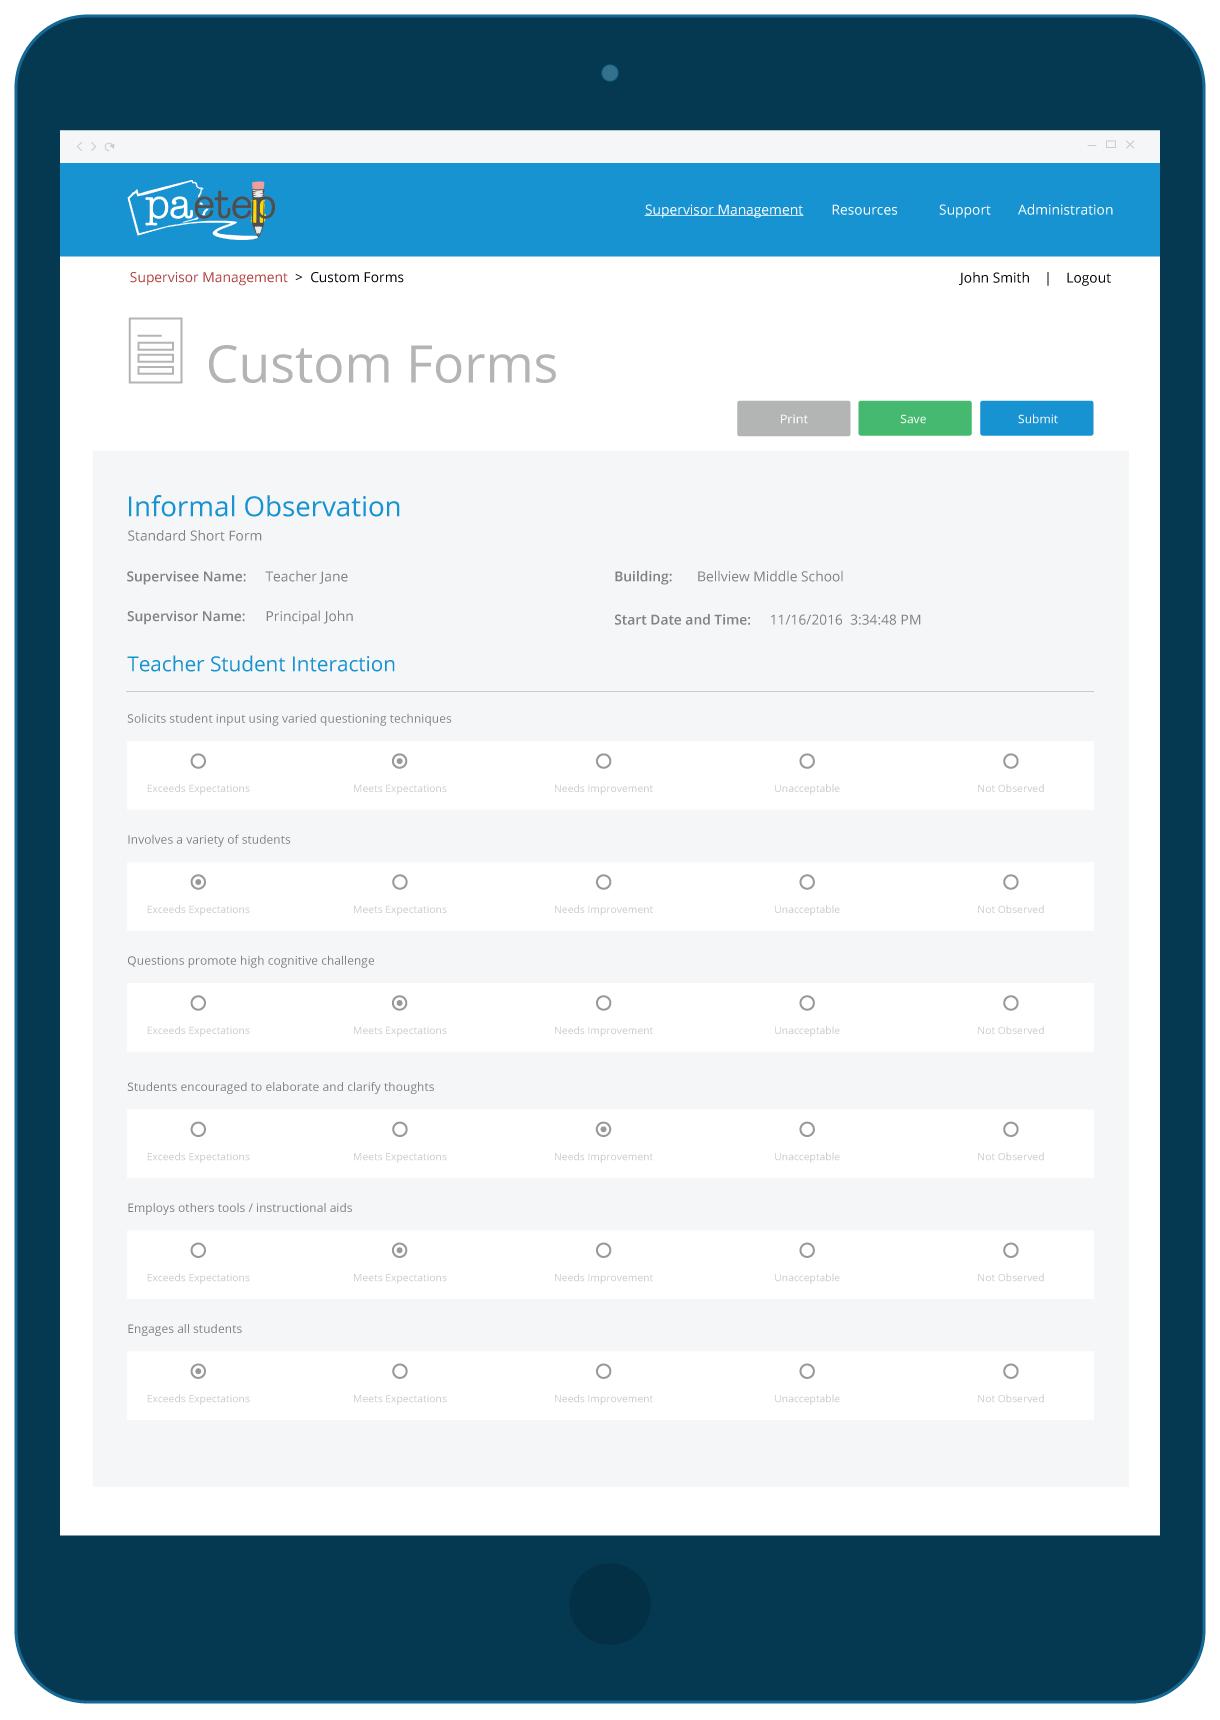 Edulink PA-ETEP Informal Observation Form Interface